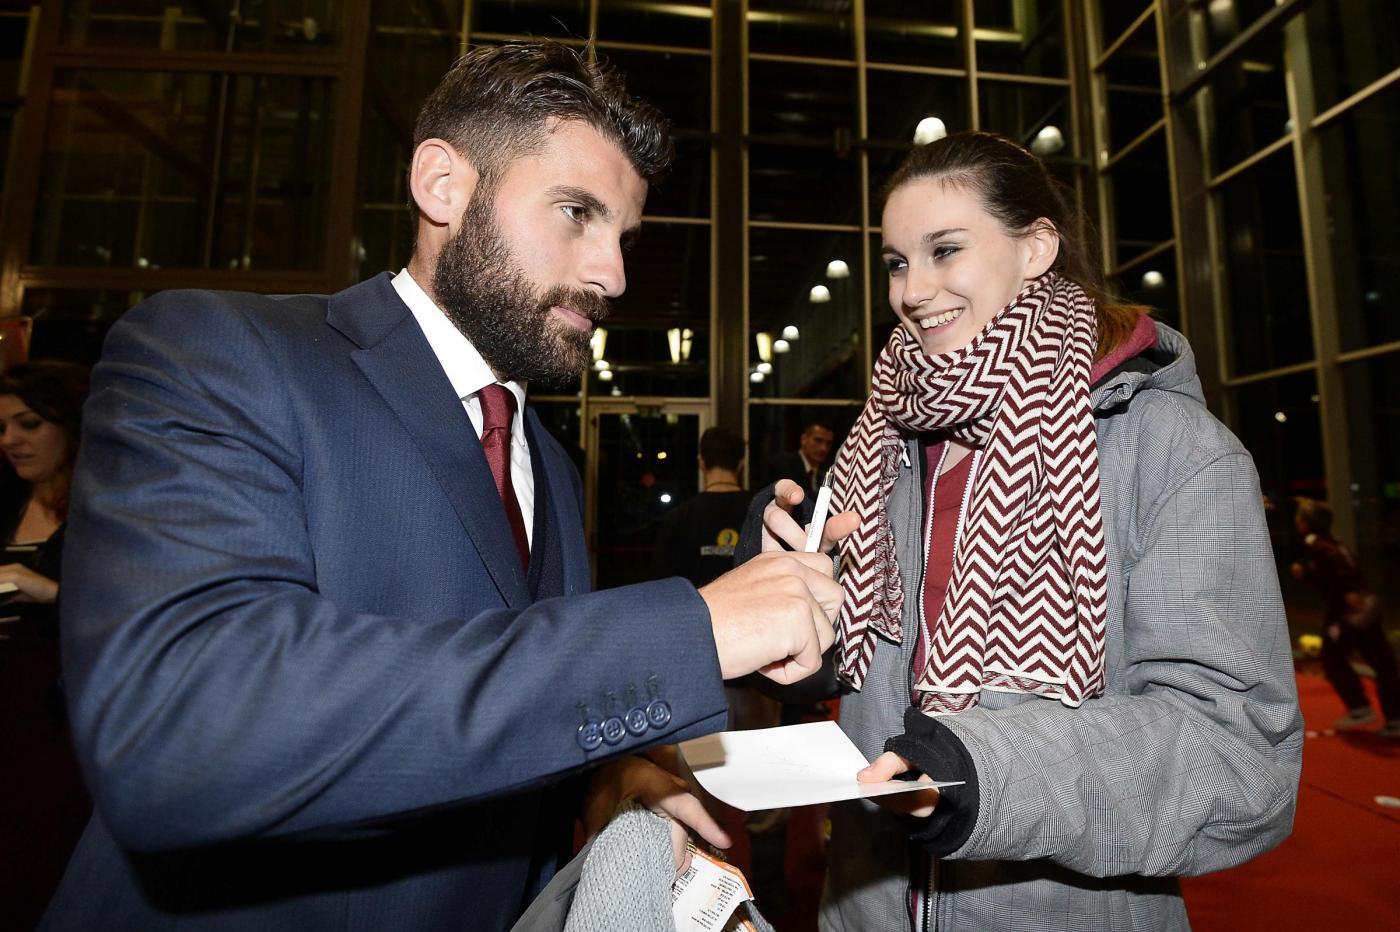 Calciomercato Parma 2014/15: cinque arrivi per la salvezza disperata